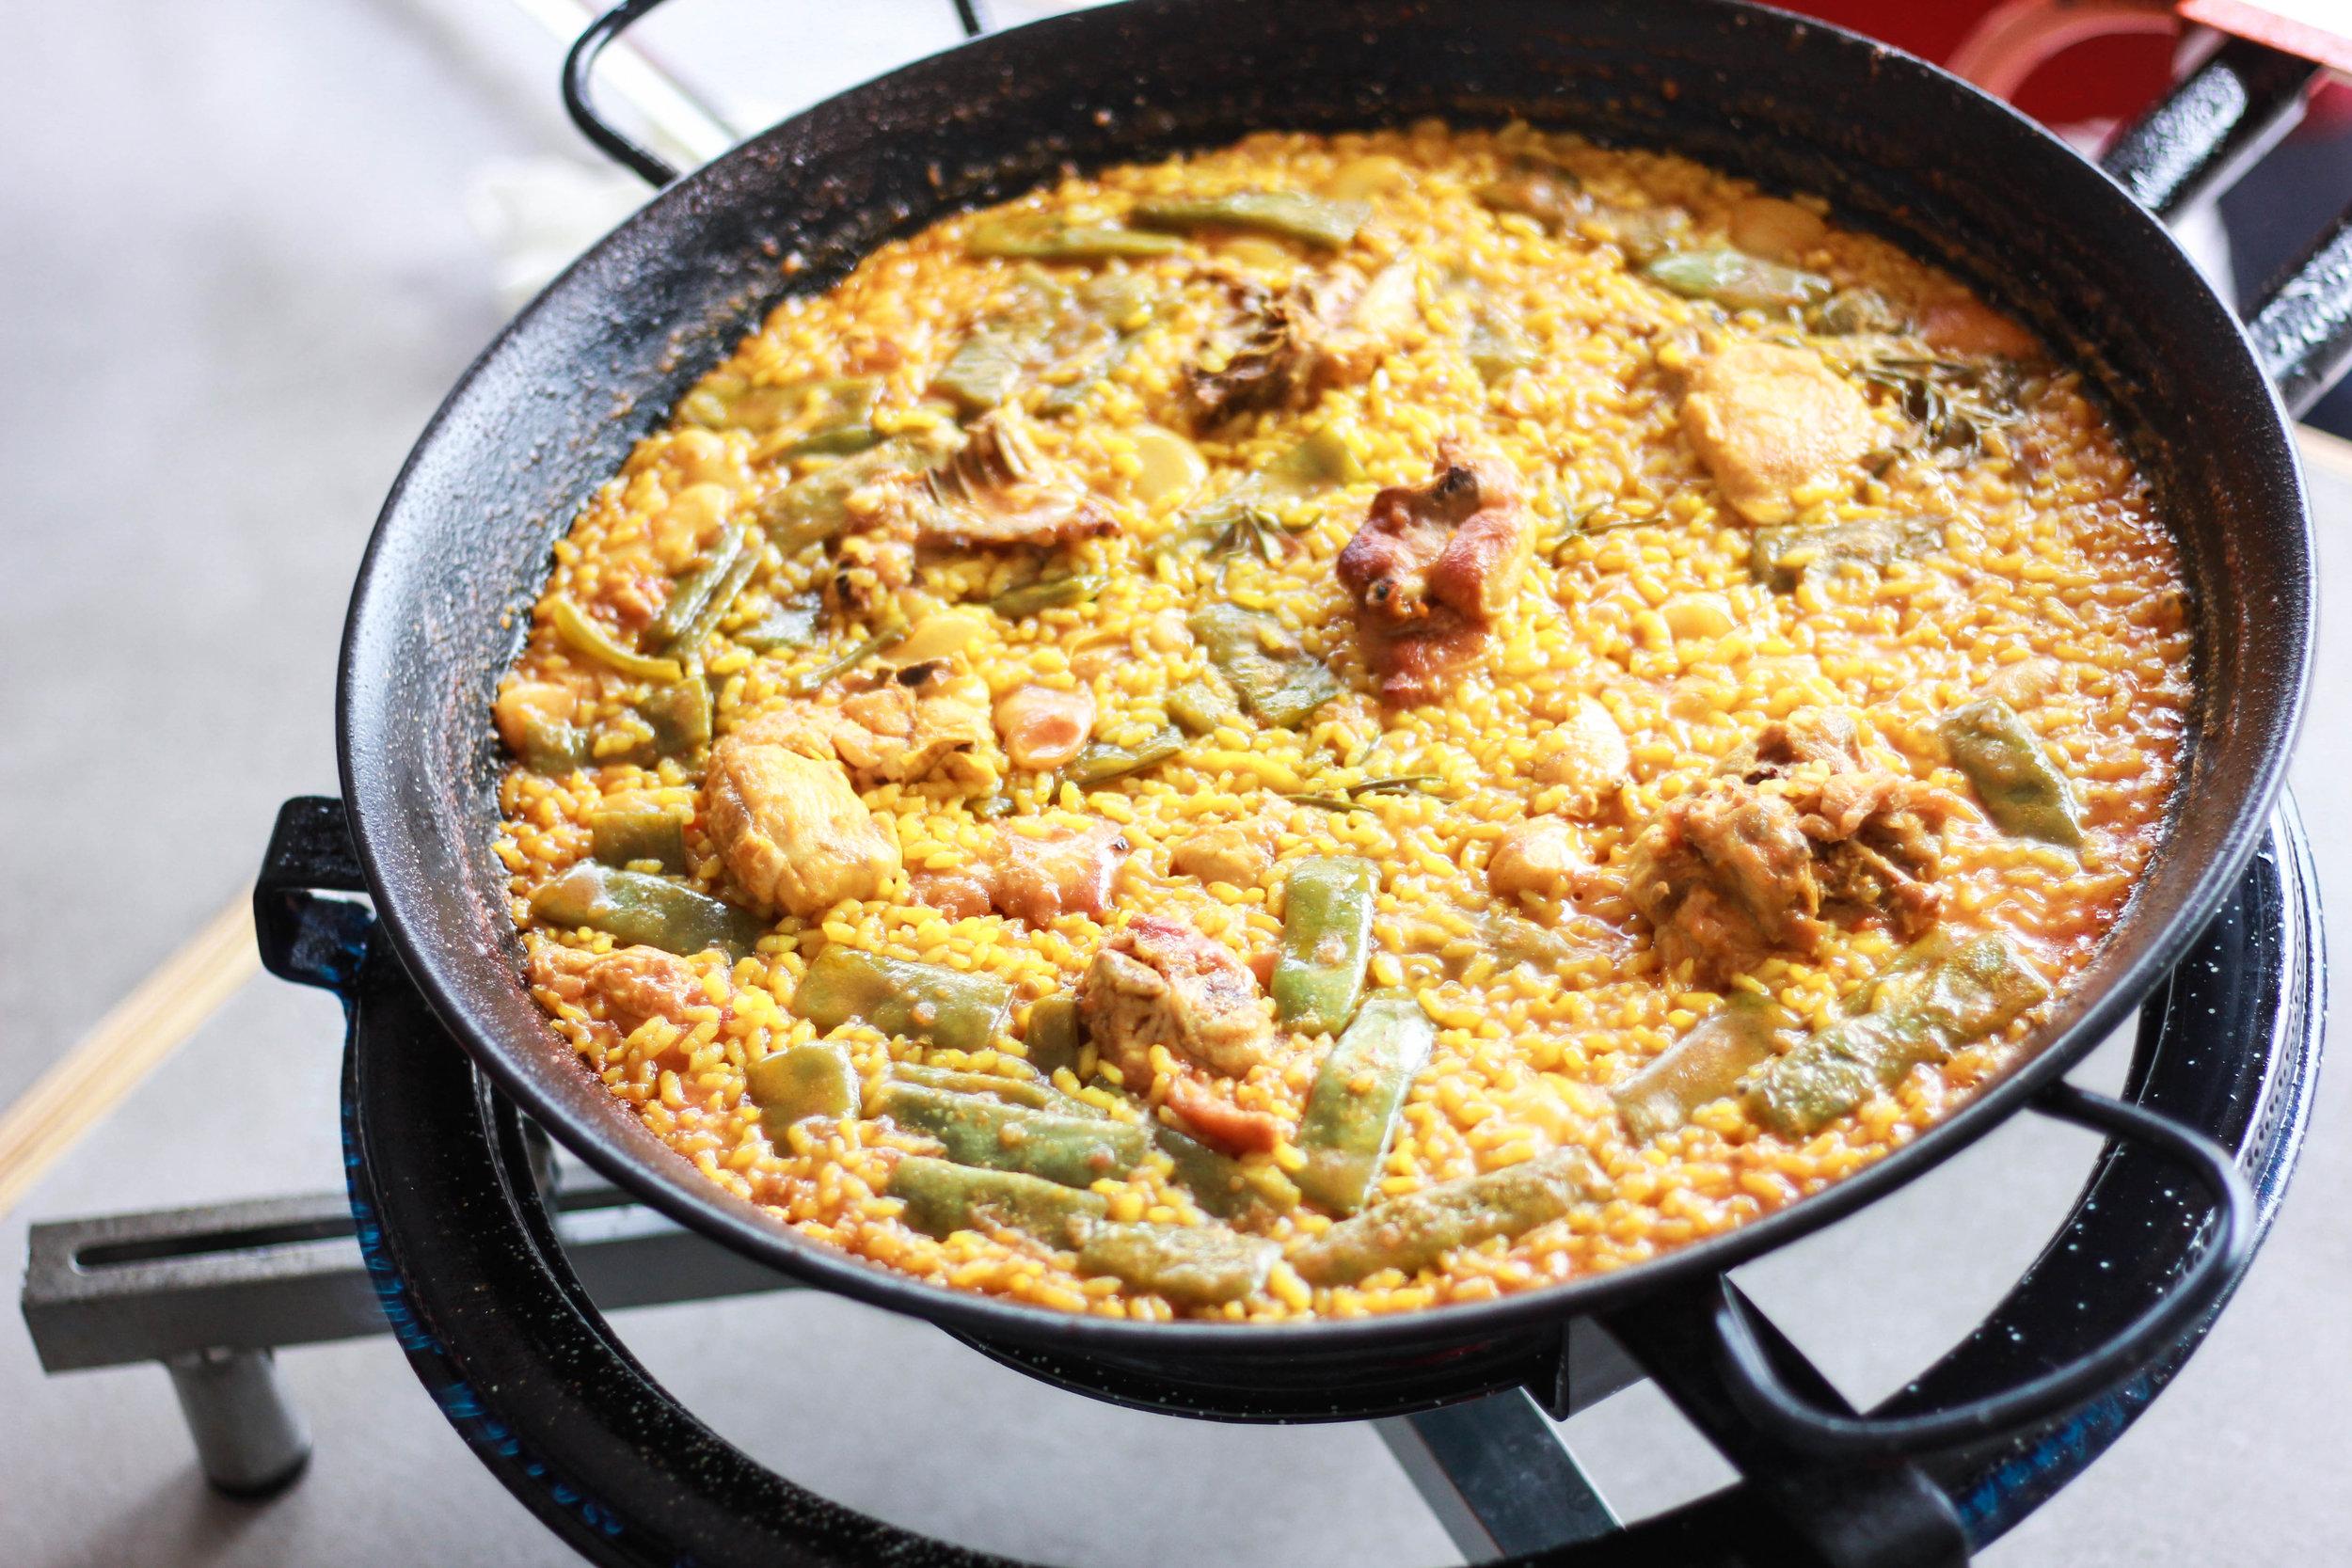 The finished product at Mi Paella En El Huerto